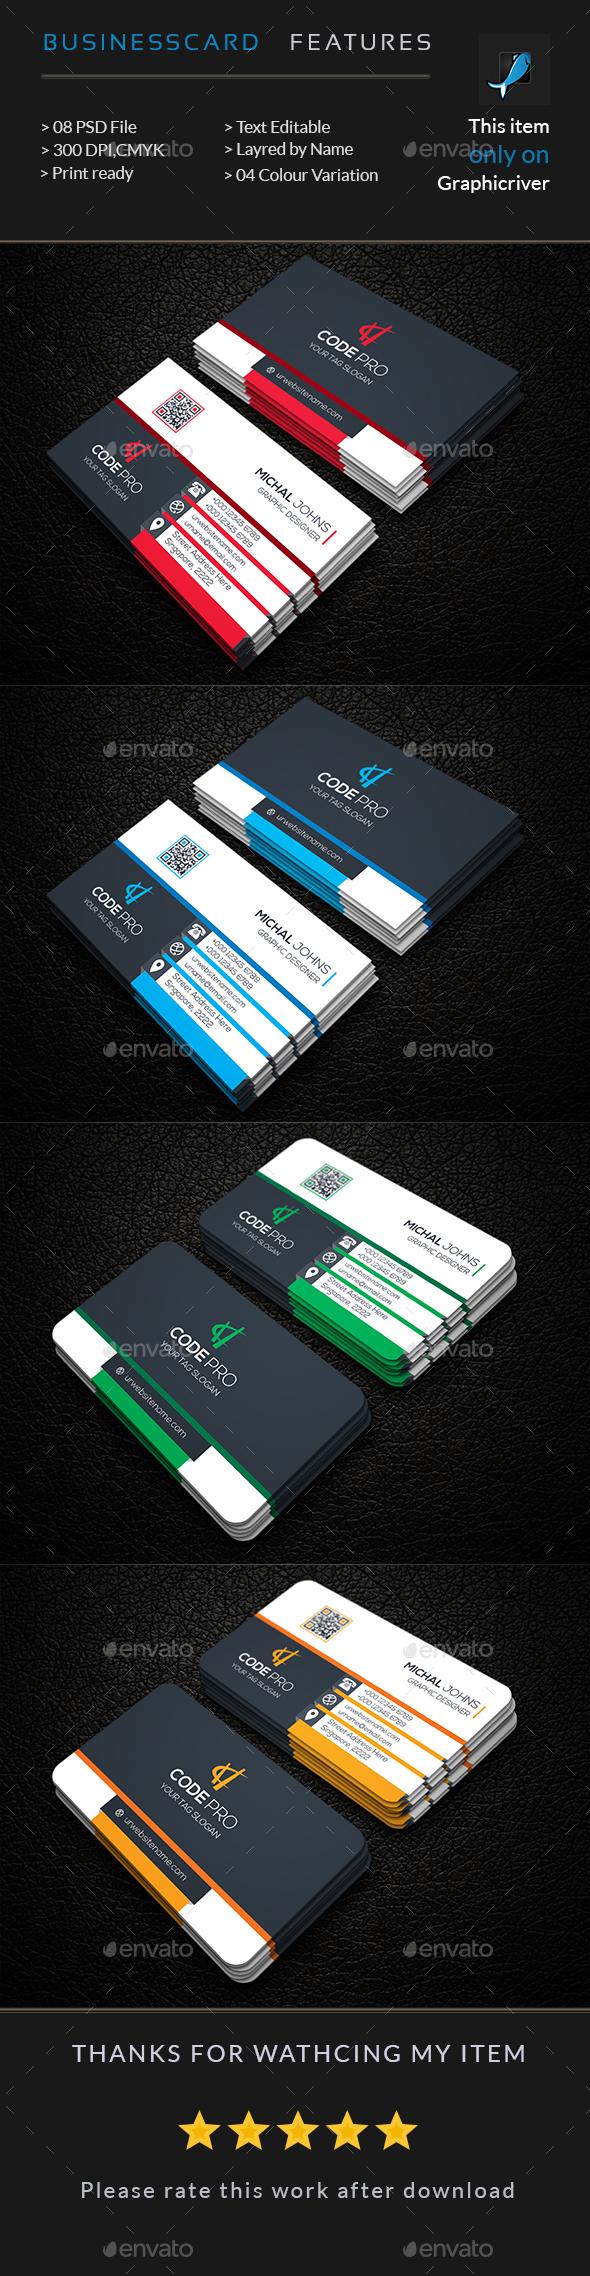 Business card business cards print templates download here https business card business cards print templates download here httpsgraphicriveritembusiness card17543712srank73refal fatih colourmoves